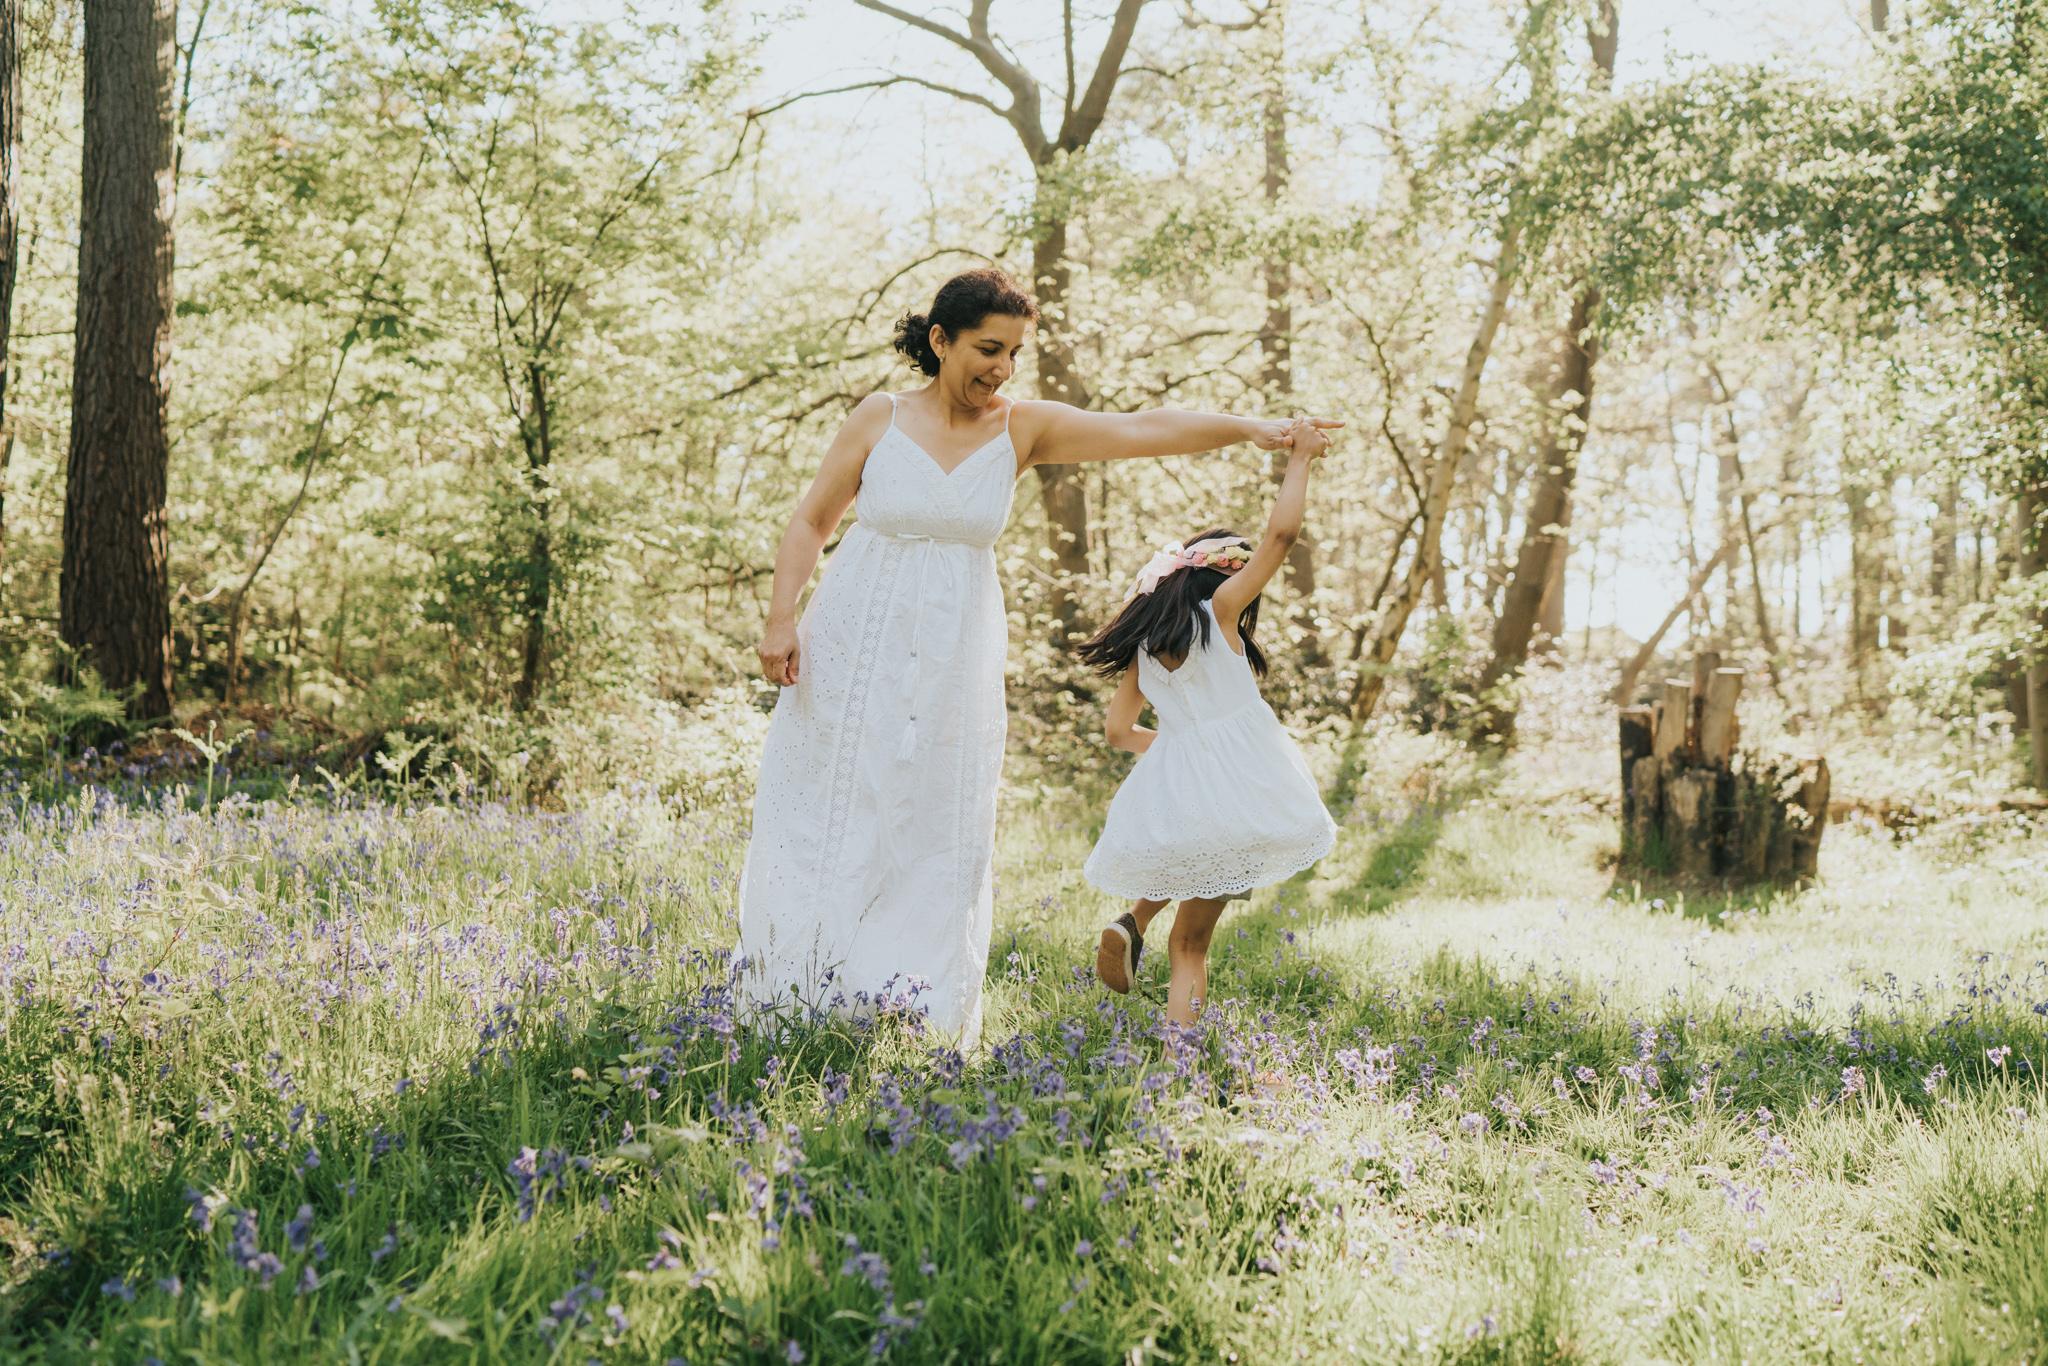 Chandrasiri-Family-Session-Woodland-Colchester-Essex-Grace-Elizabeth-Alternative-Wedding-Photographer (1 of 1).jpg (32 of 34).jpg